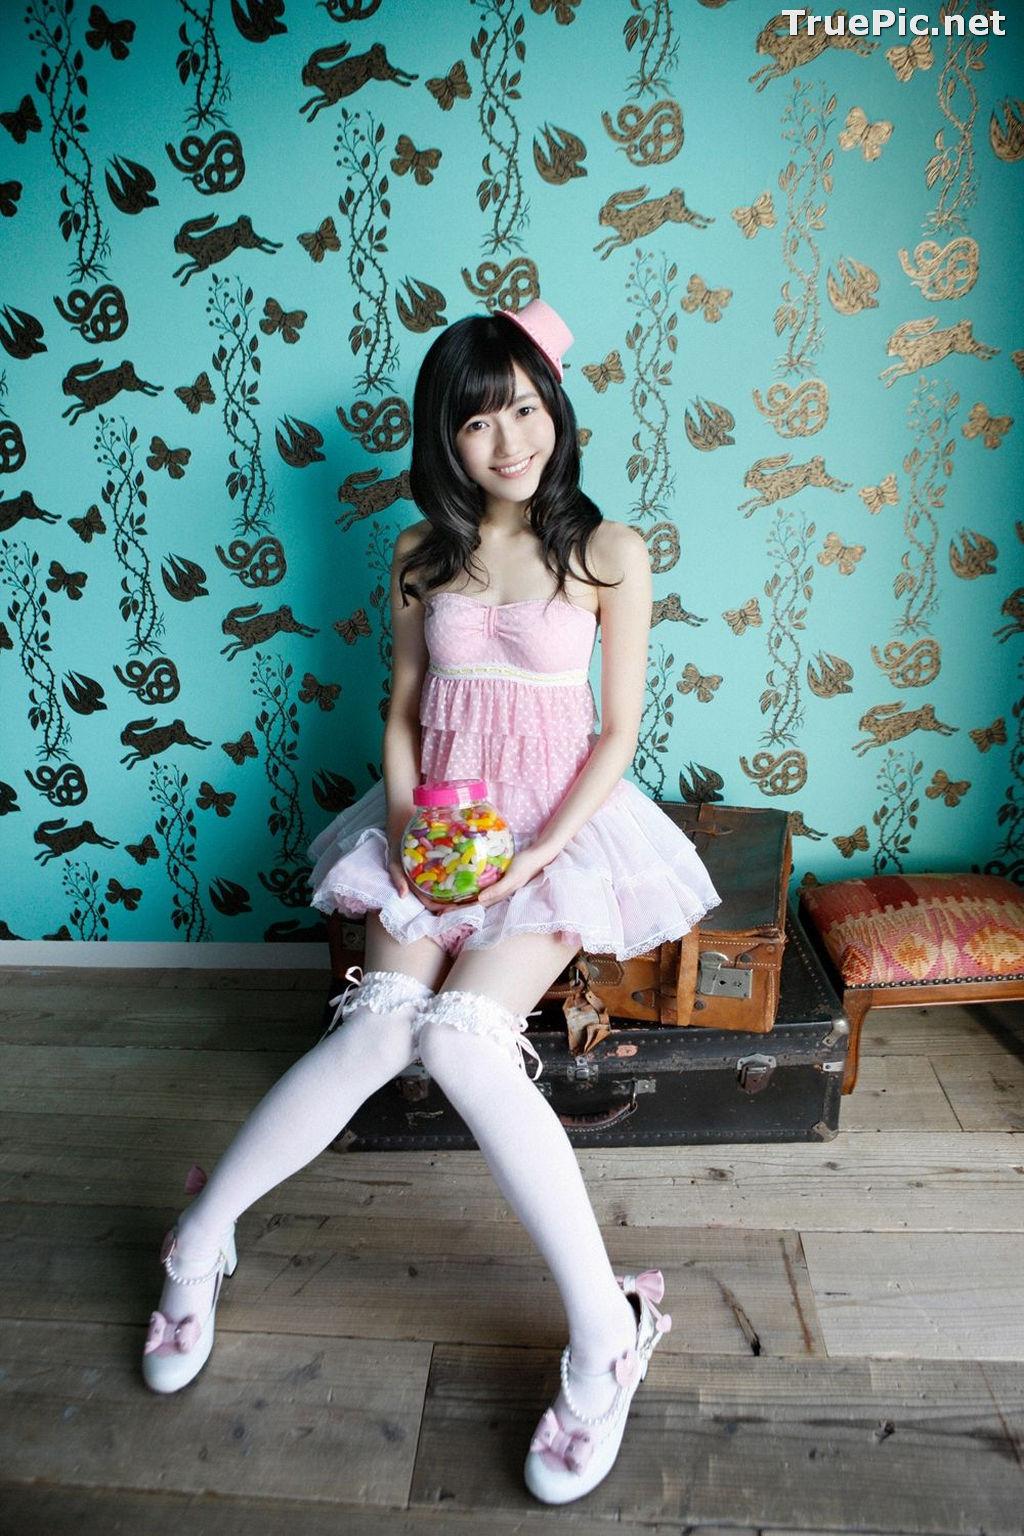 Image [YS Web] Vol.531 - Japanese Idol Girl Group (AKB48) - Mayu Watanabe - TruePic.net - Picture-1